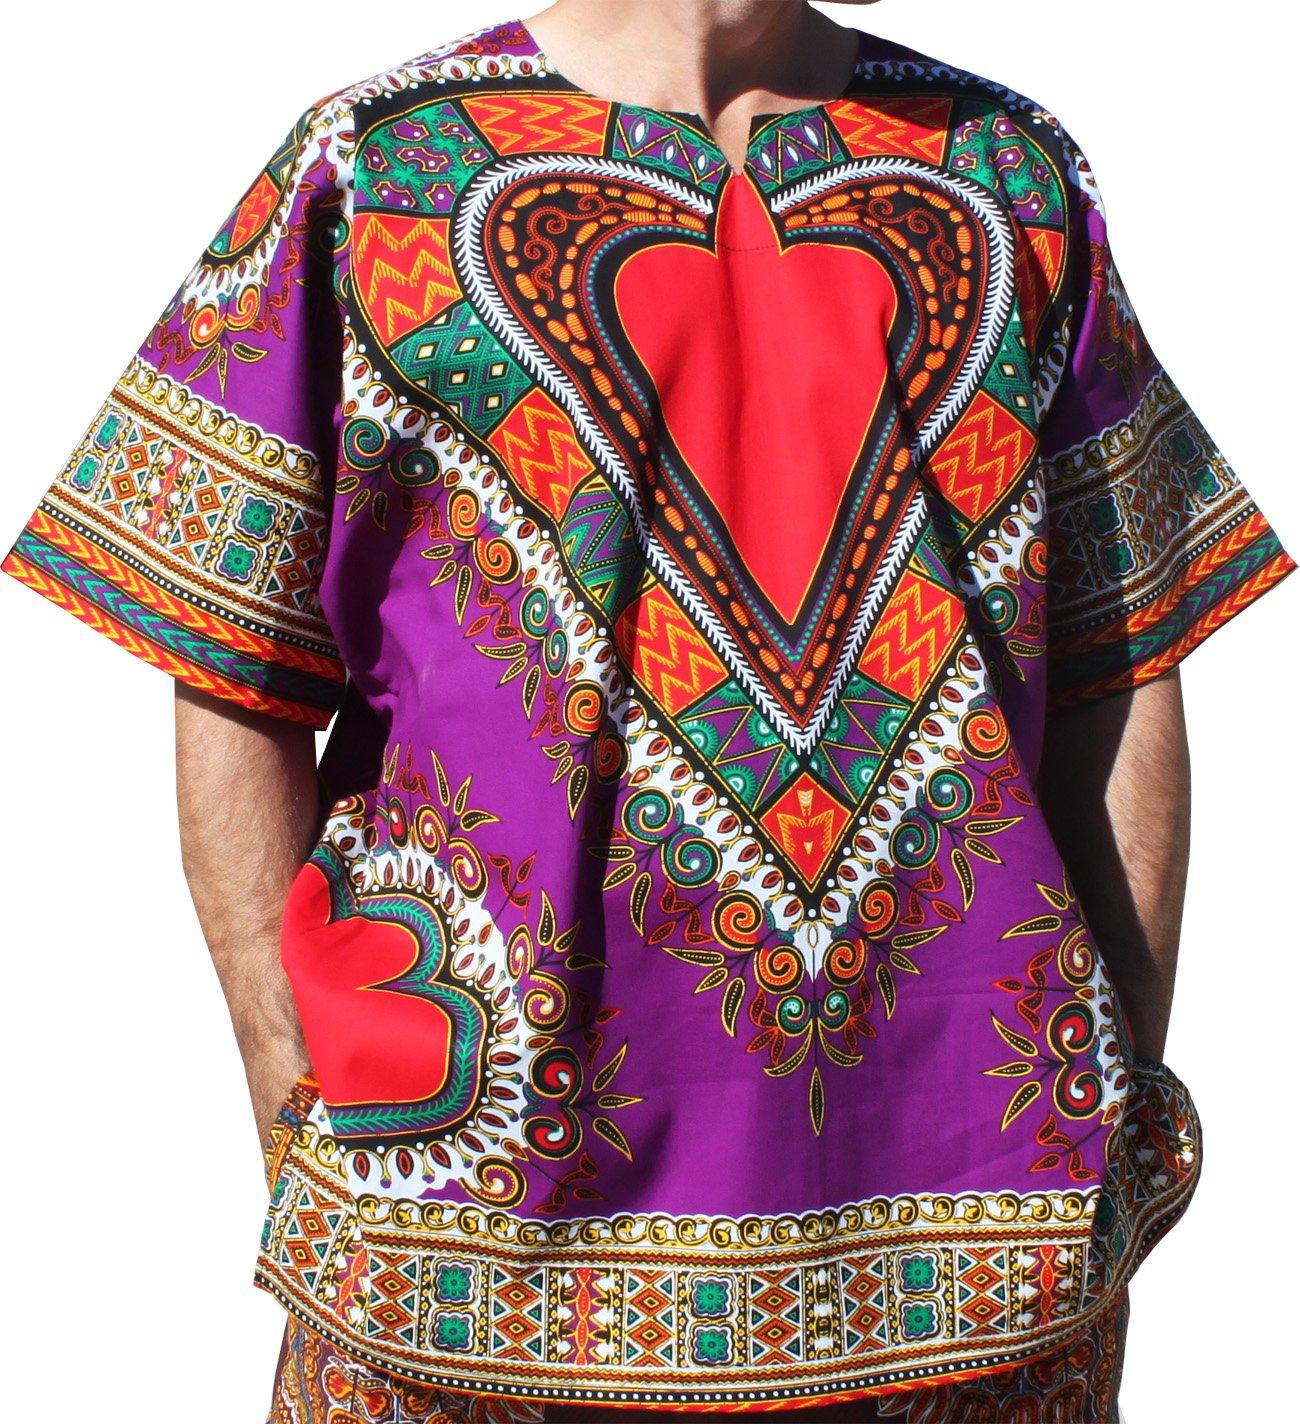 RaanPahMuang Bright Heart Cotton Africa Dashiki Plus Sized Shirt Plain Front, XXXXX-Large, Purple by RaanPahMuang